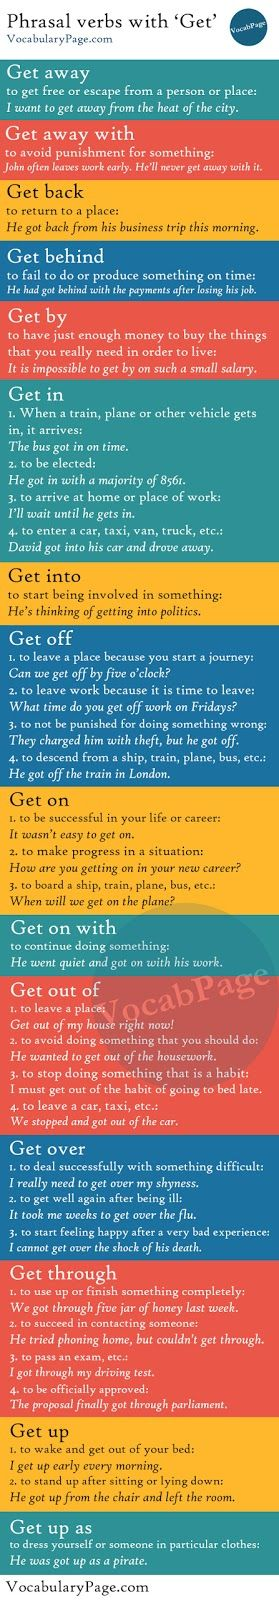 Get phrasal verbs www.vocabularypage.com